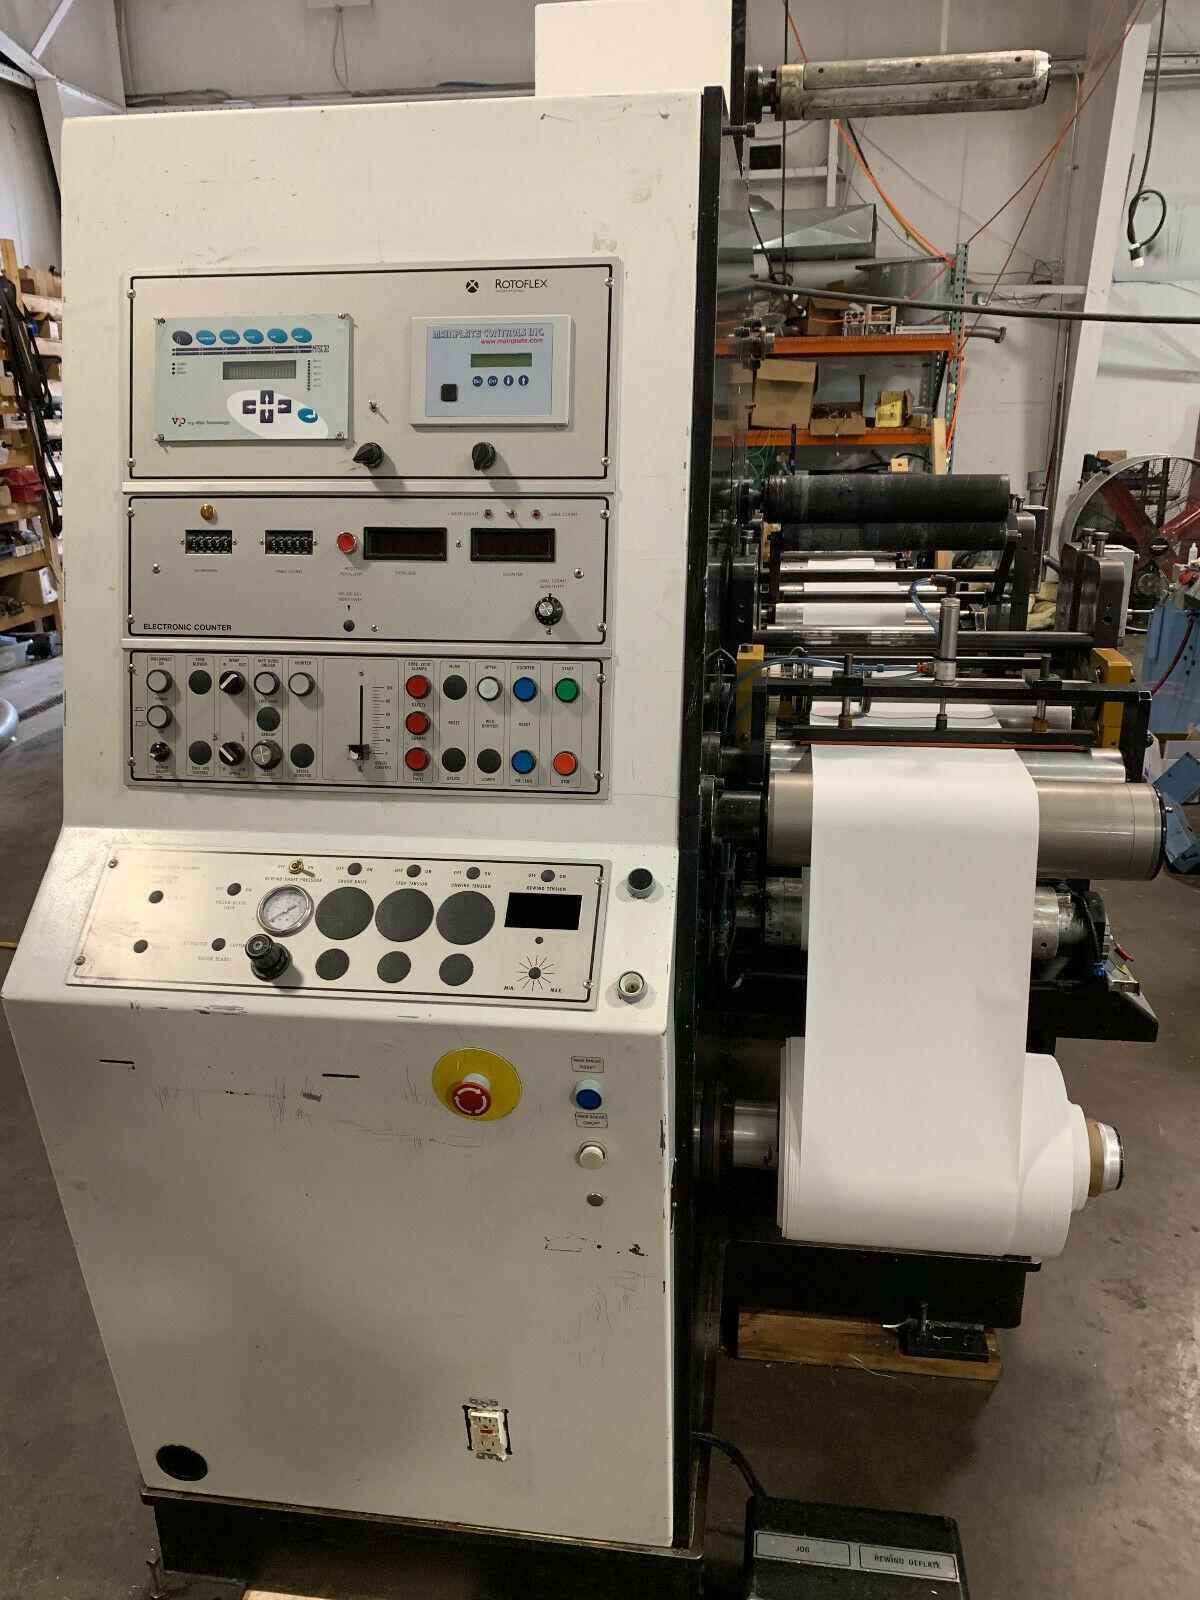 Rotoflex DLI330 - Used Flexo Printing Presses and Used Flexographic Equipment-3